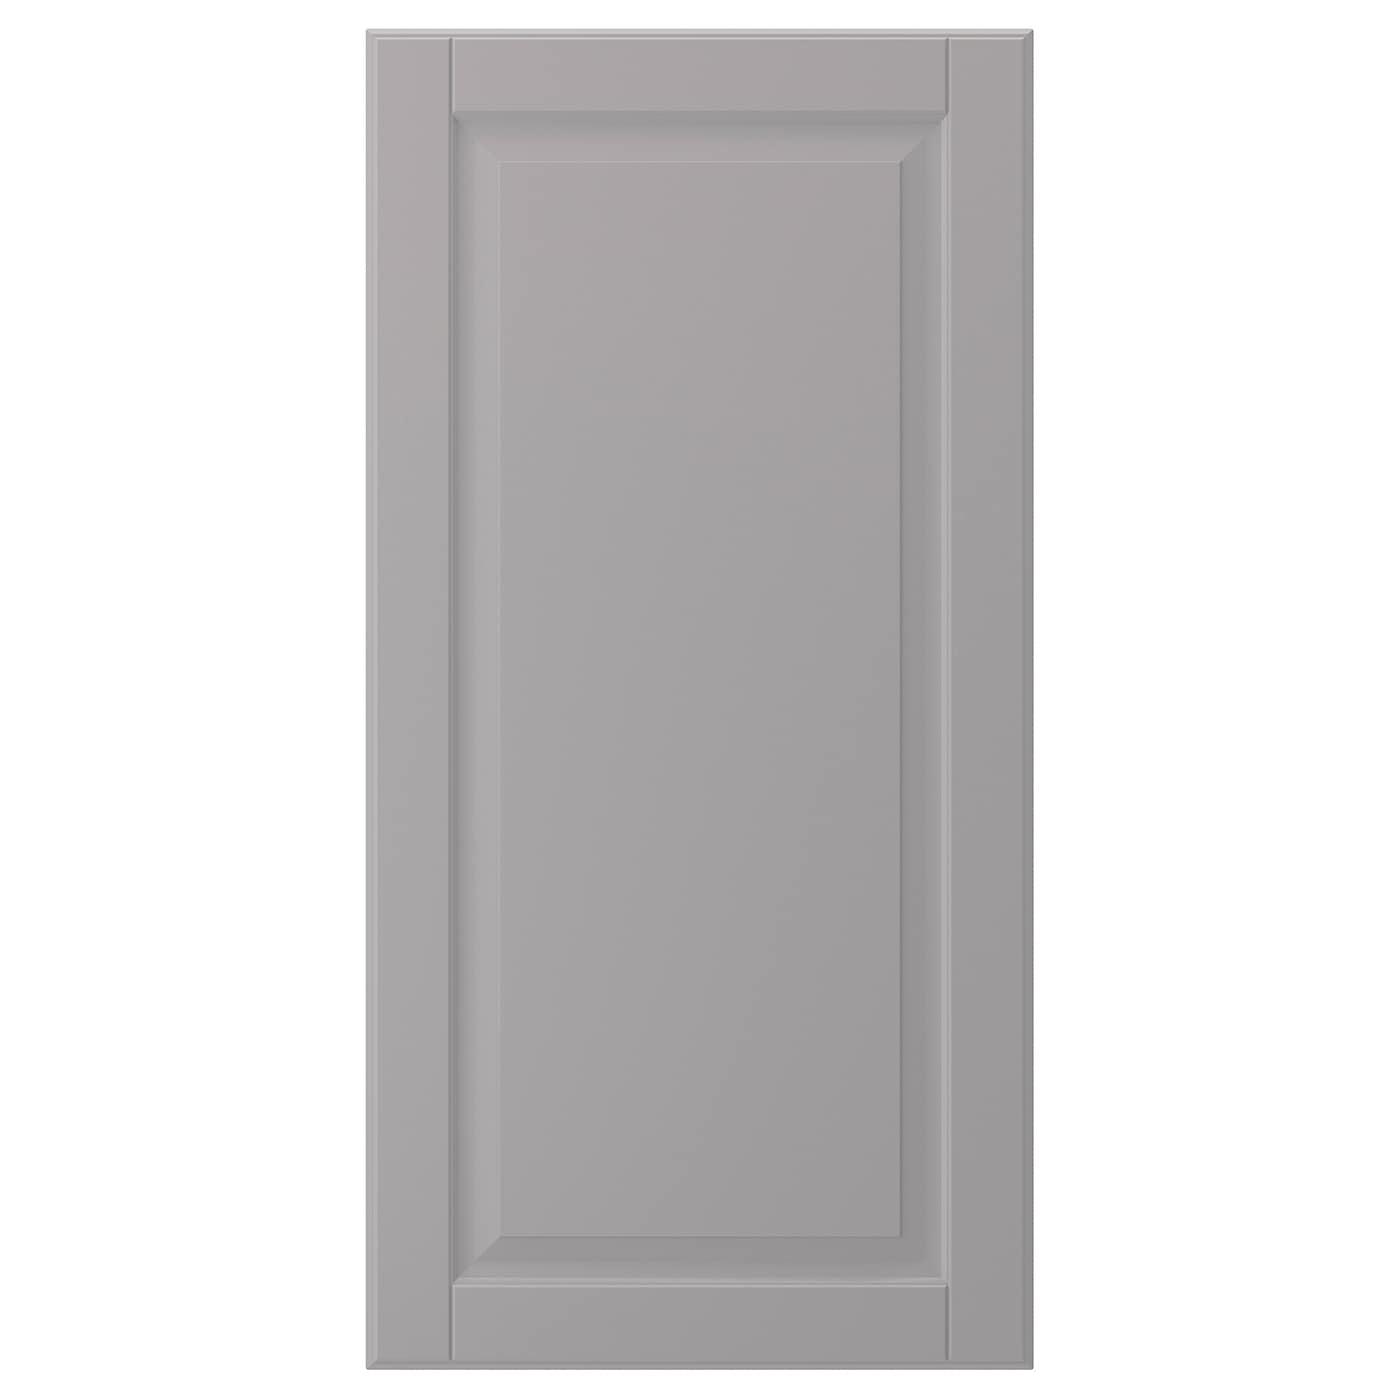 Bodbyn Door Grey 60 X 80 Cm Ikea